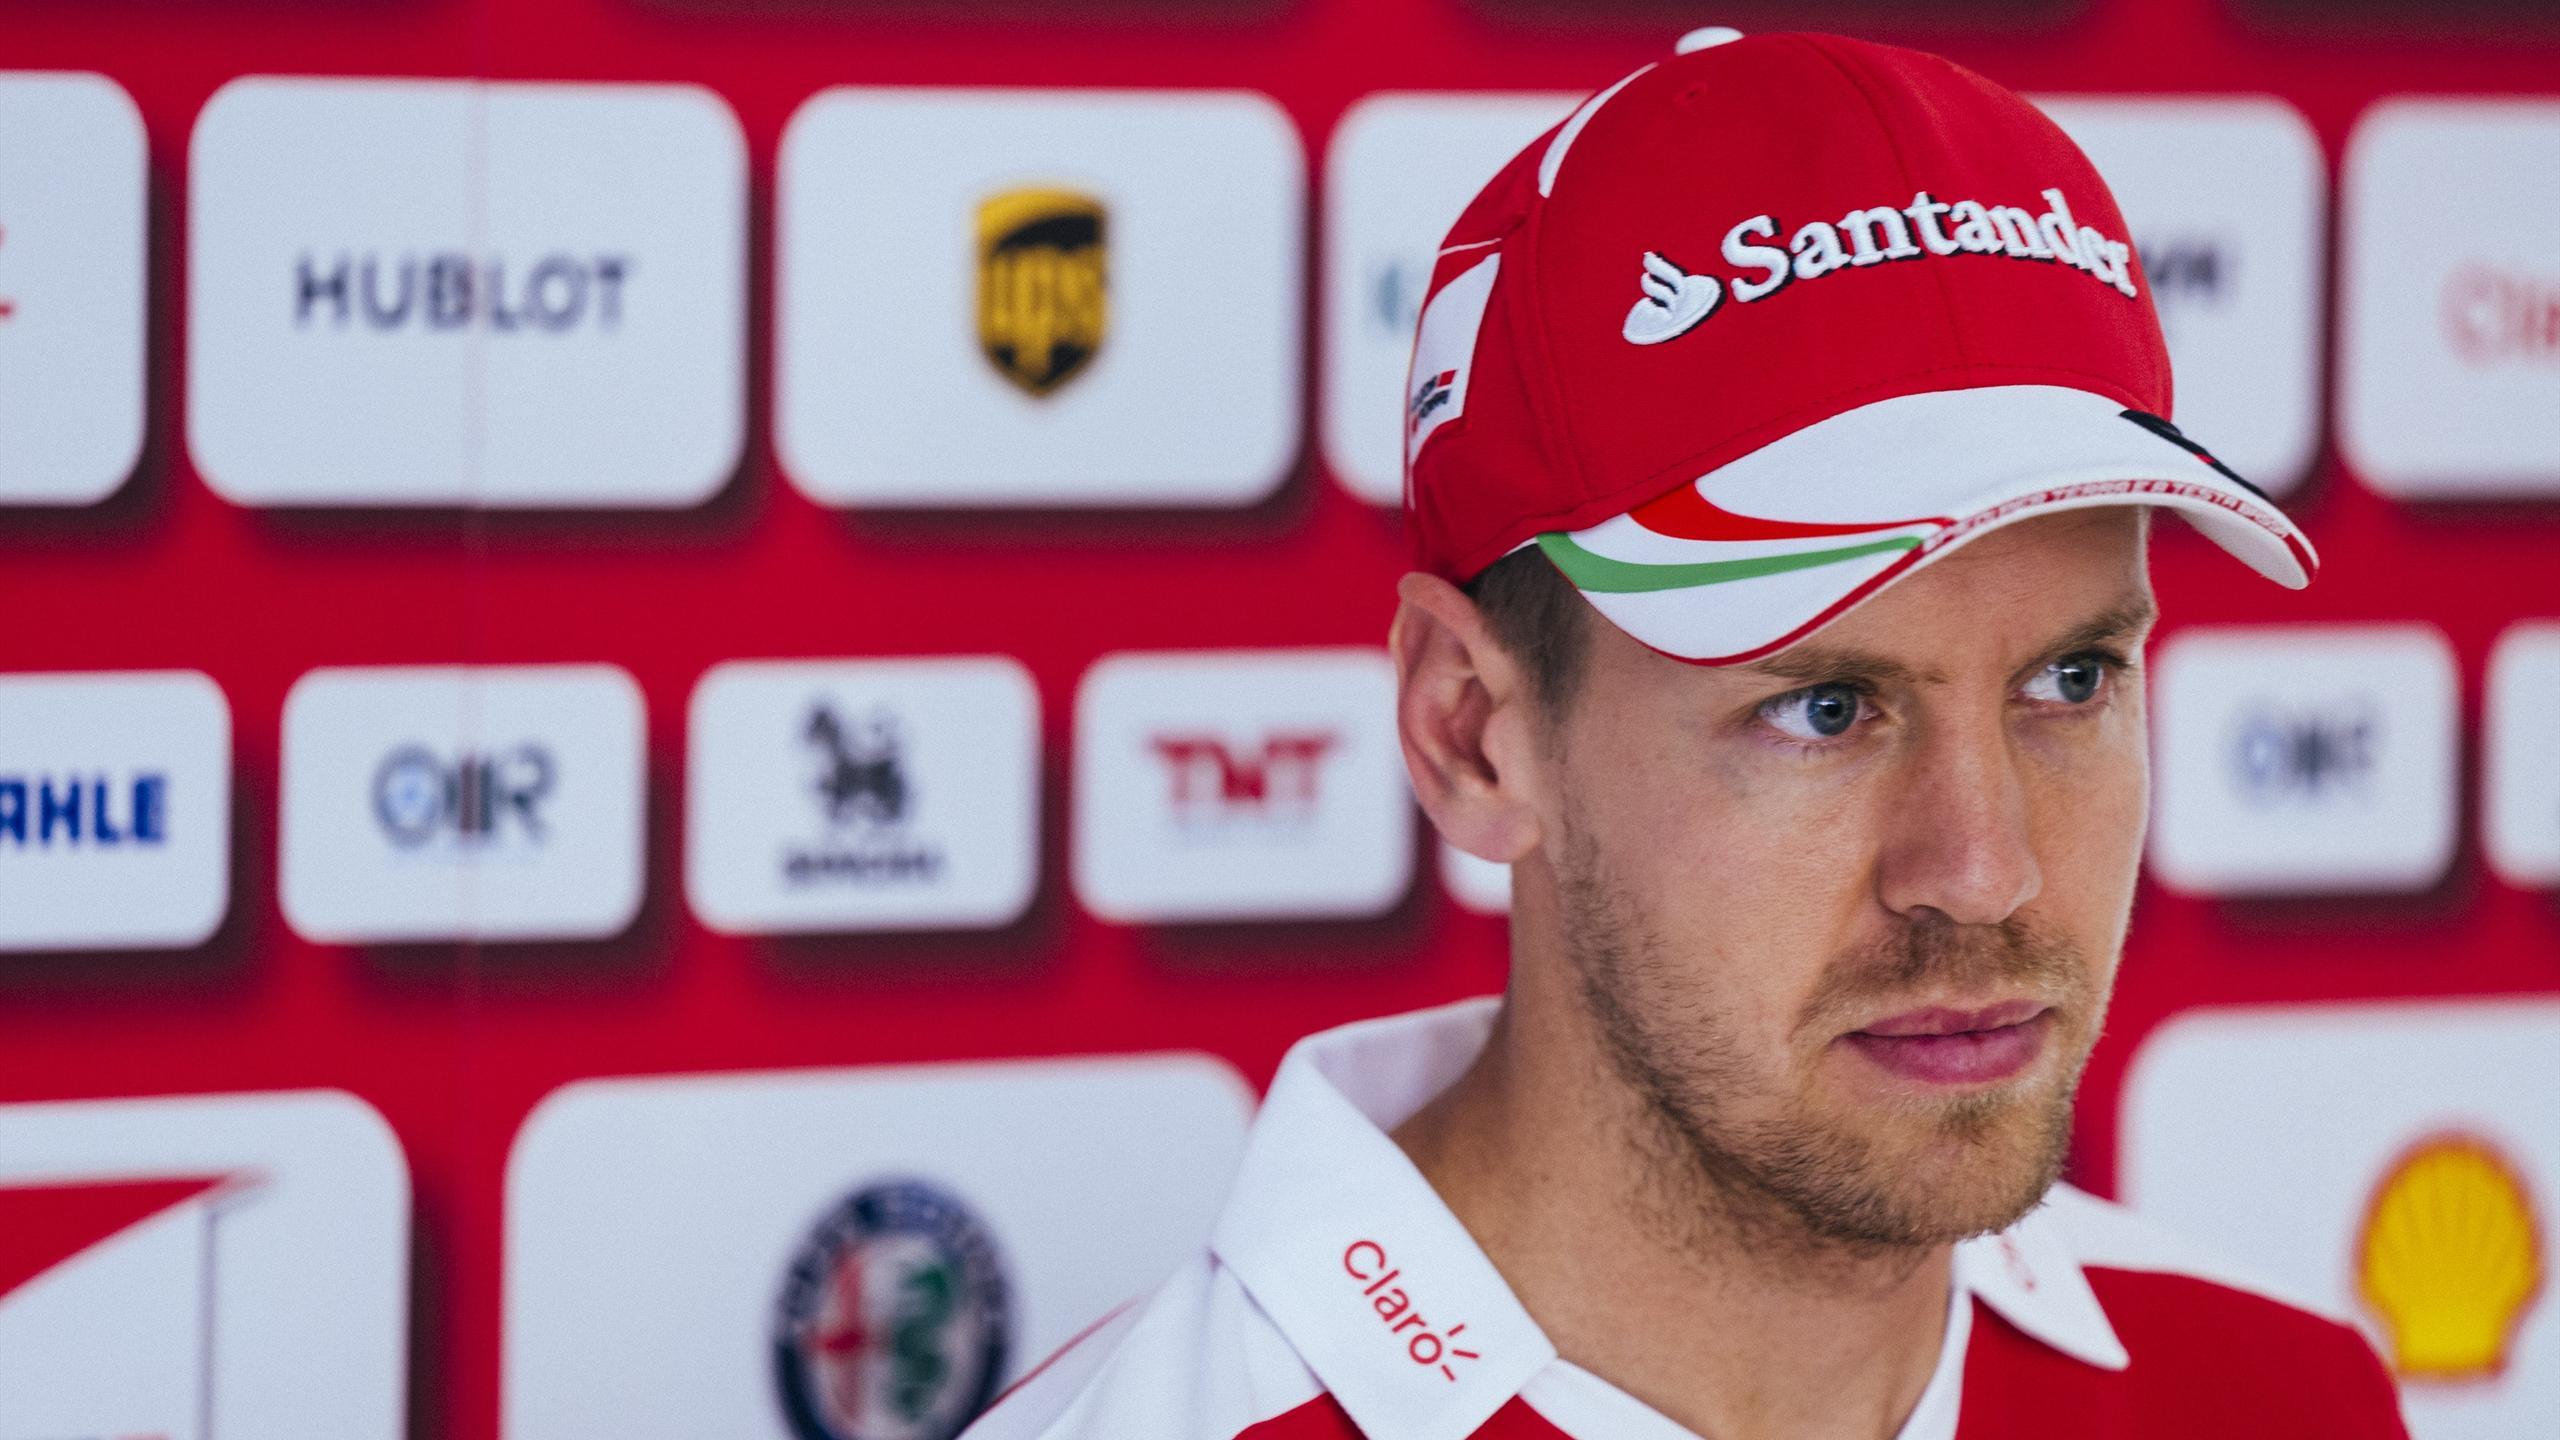 Sebastian Vettel (Ferrari) au Grand Prix d'Espagne 2016